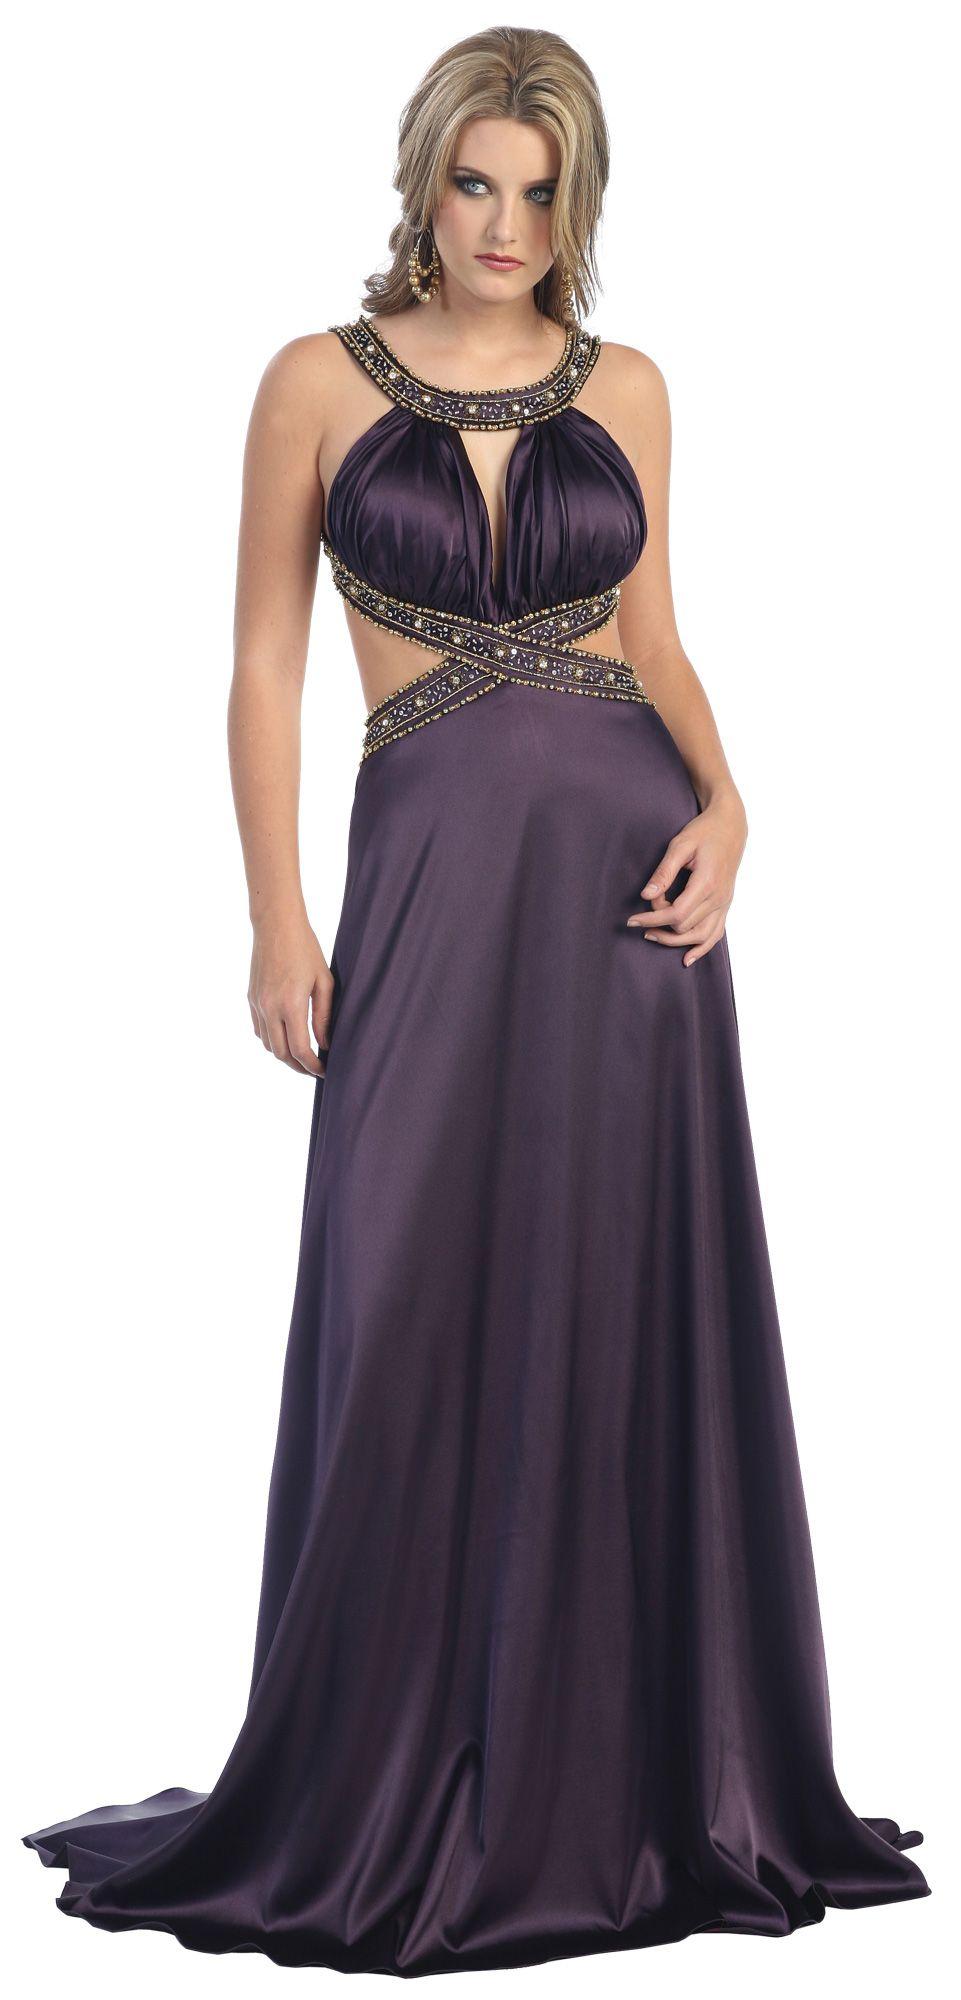 ddac330f80 Rhinestone Strap Open Back Long Prom Dress Plum Open Sides Formal Evening  Gown